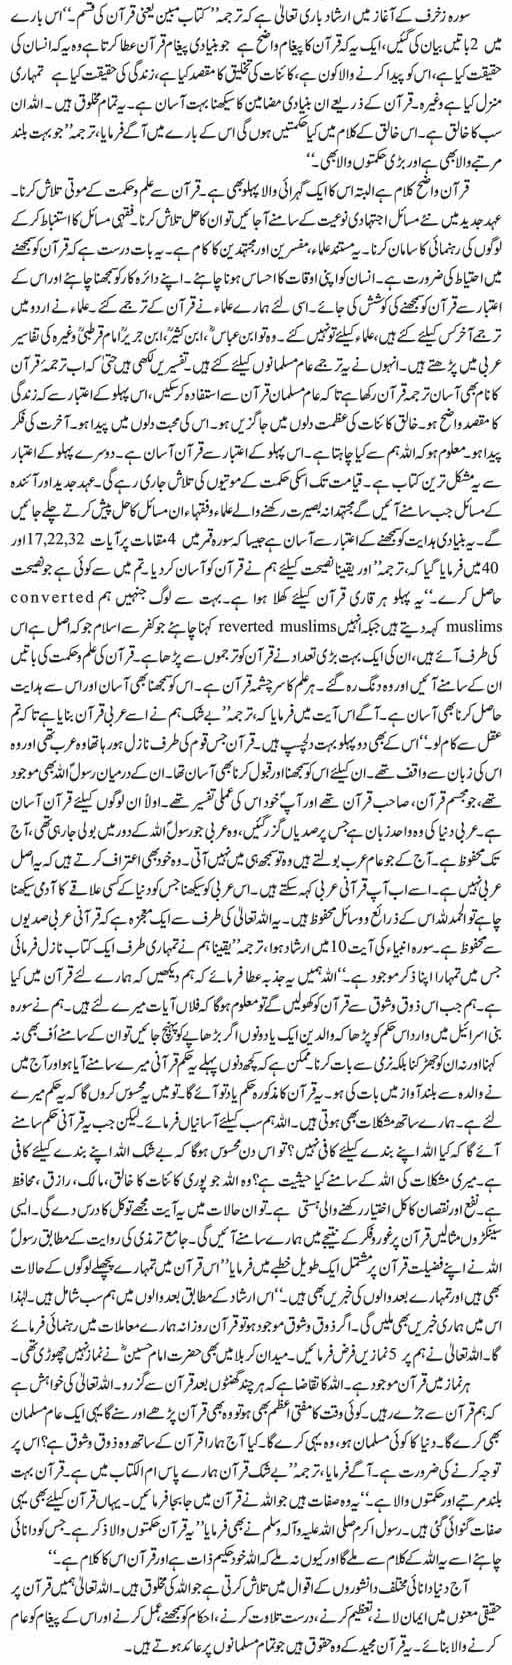 Quran KA Paigham